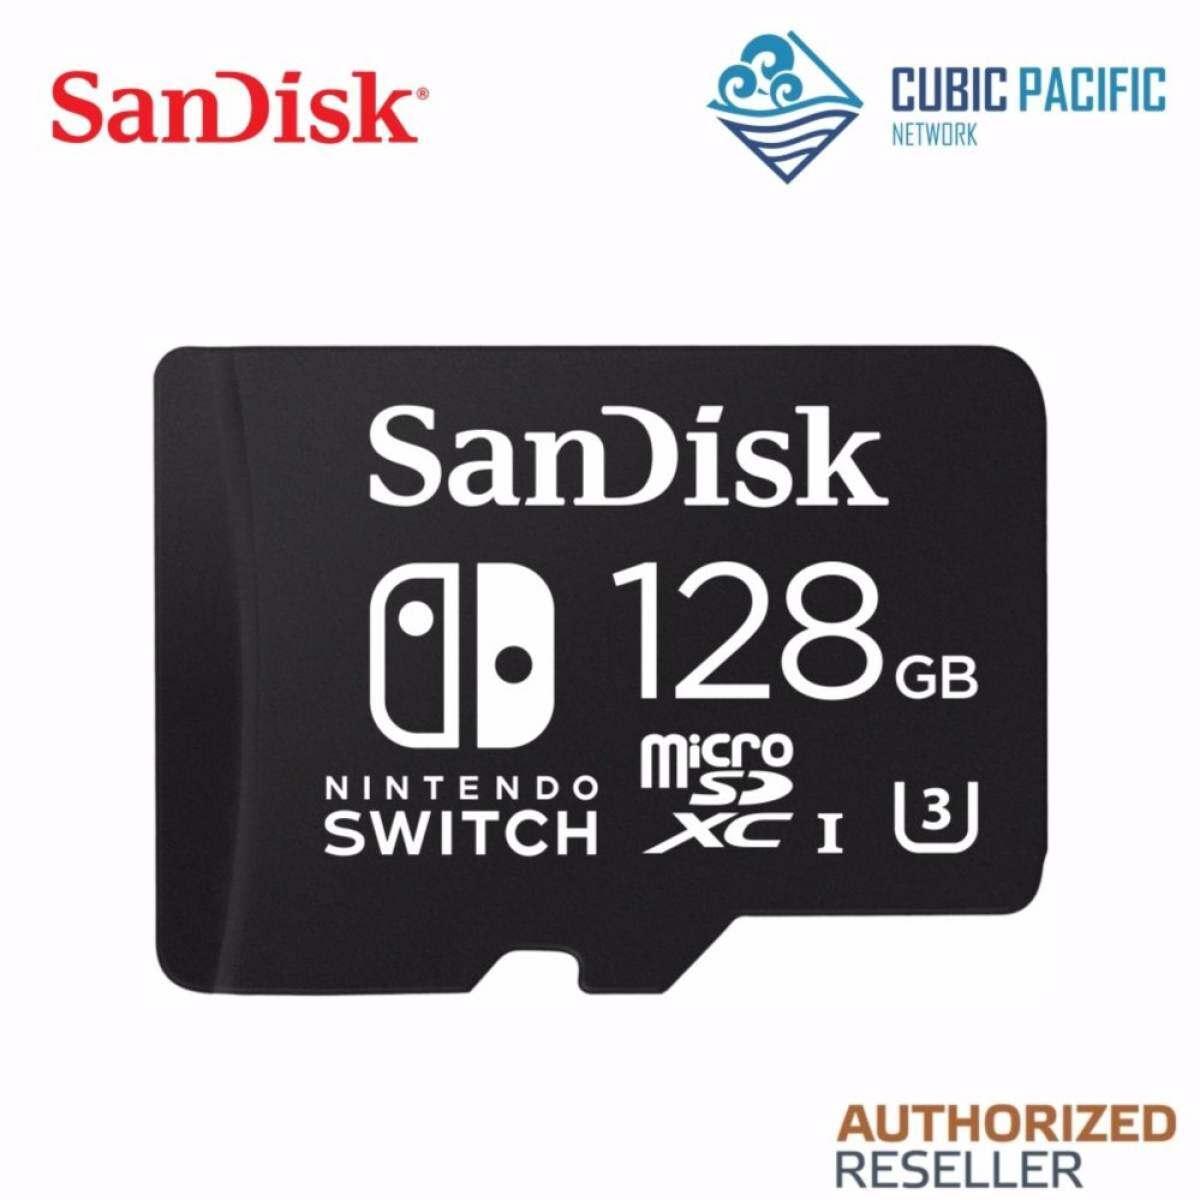 SanDisk Nintendo Switch 128 GB 100 MB/s U3 UHS I Micro SDHC Kartu Memori (SDSQXAO-128G-GN6ZA)